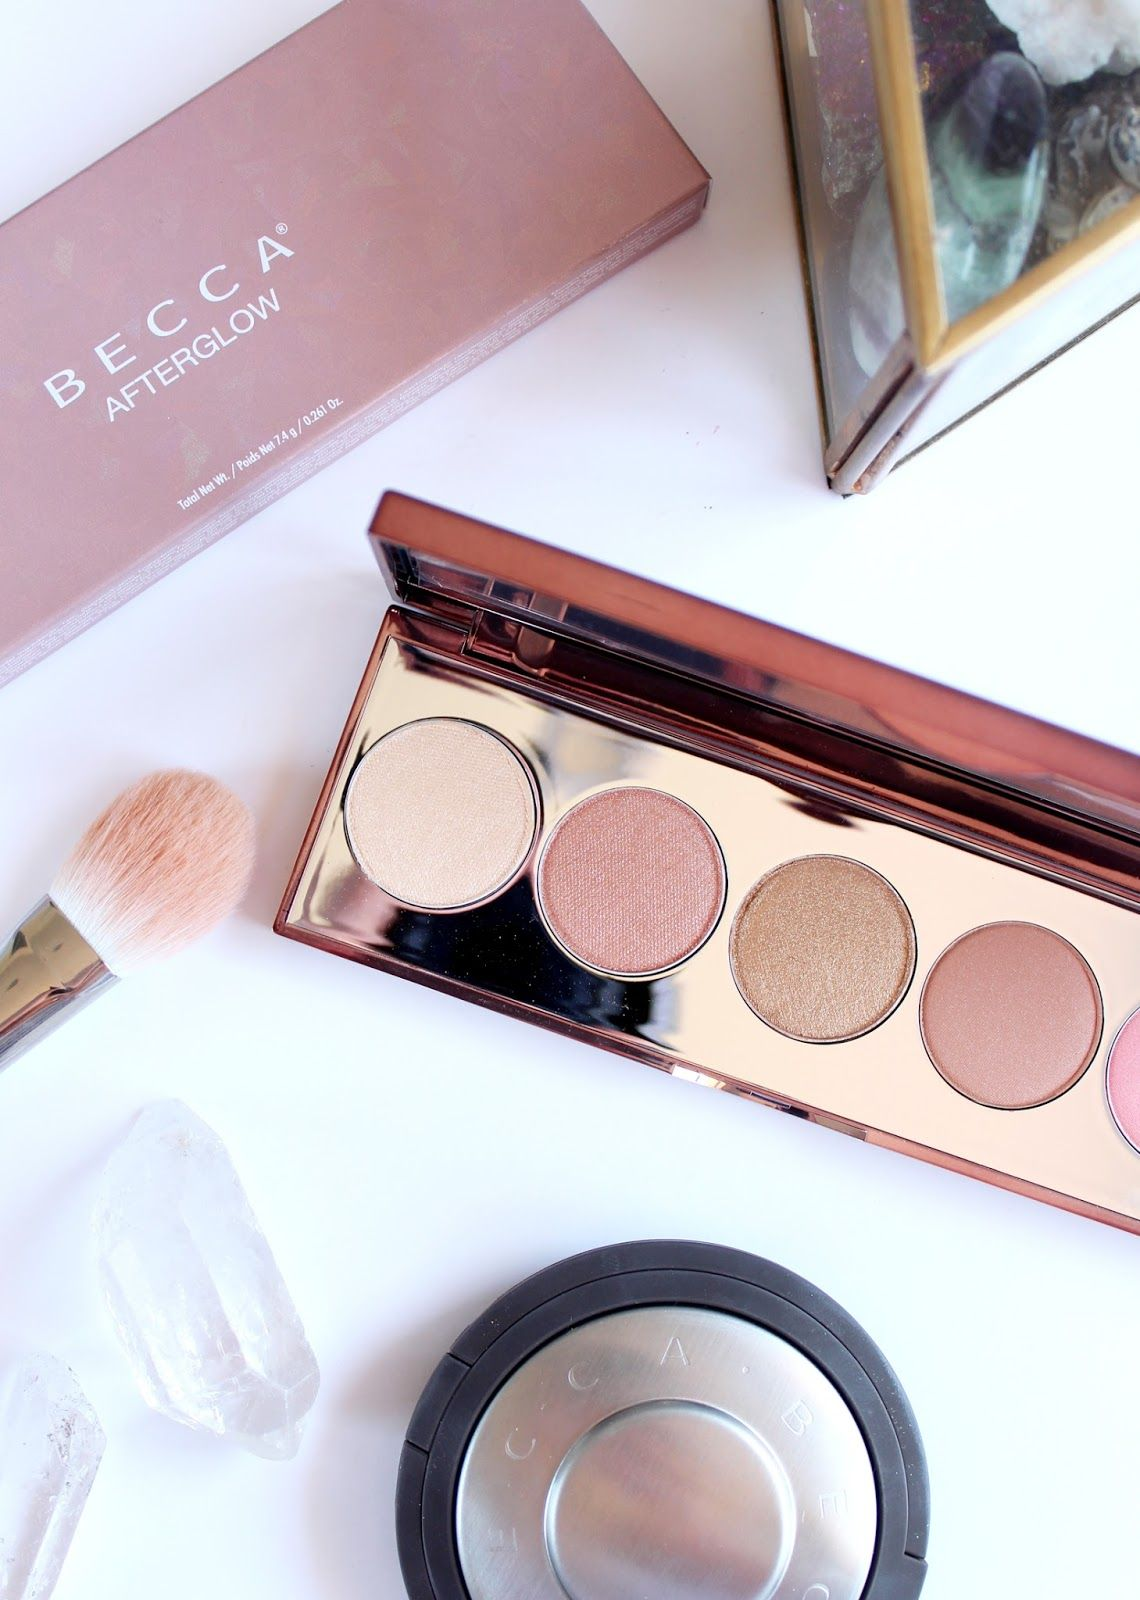 BECCA COSMETICS Becca cosmetics, makeup, Eyeshadow